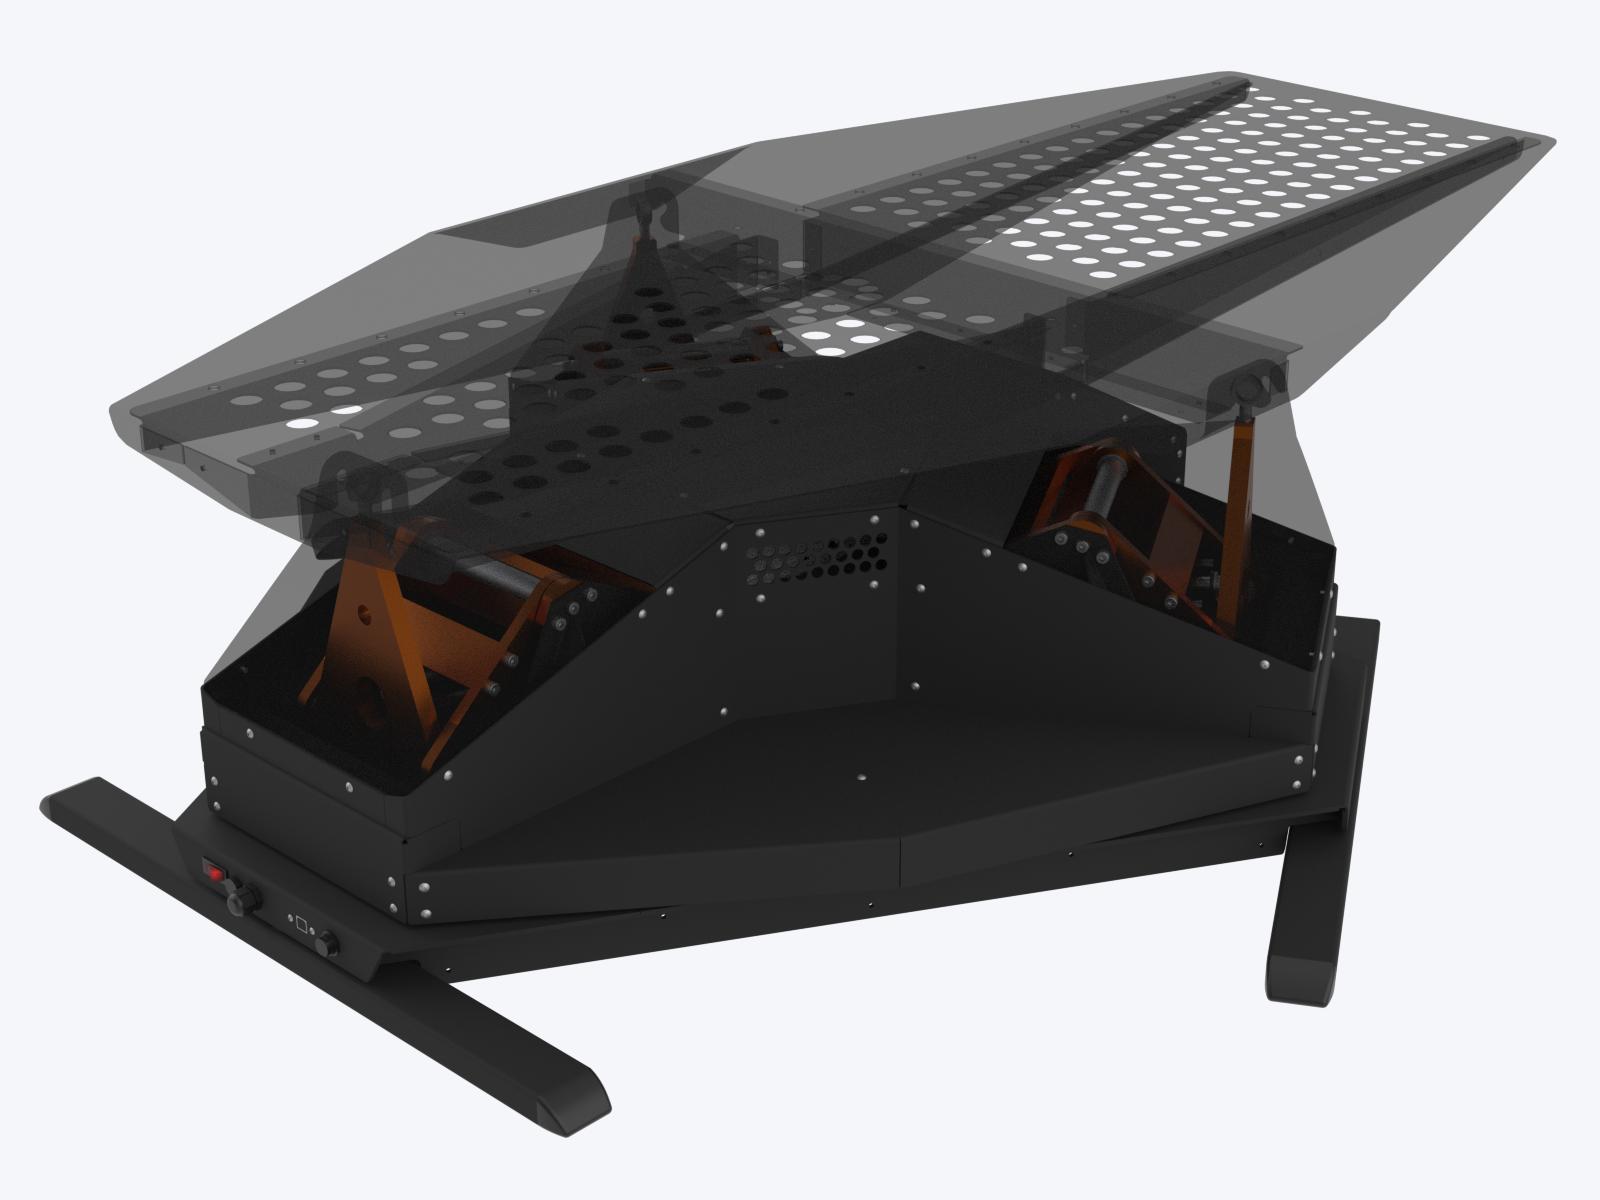 4-DoF Motion Platform